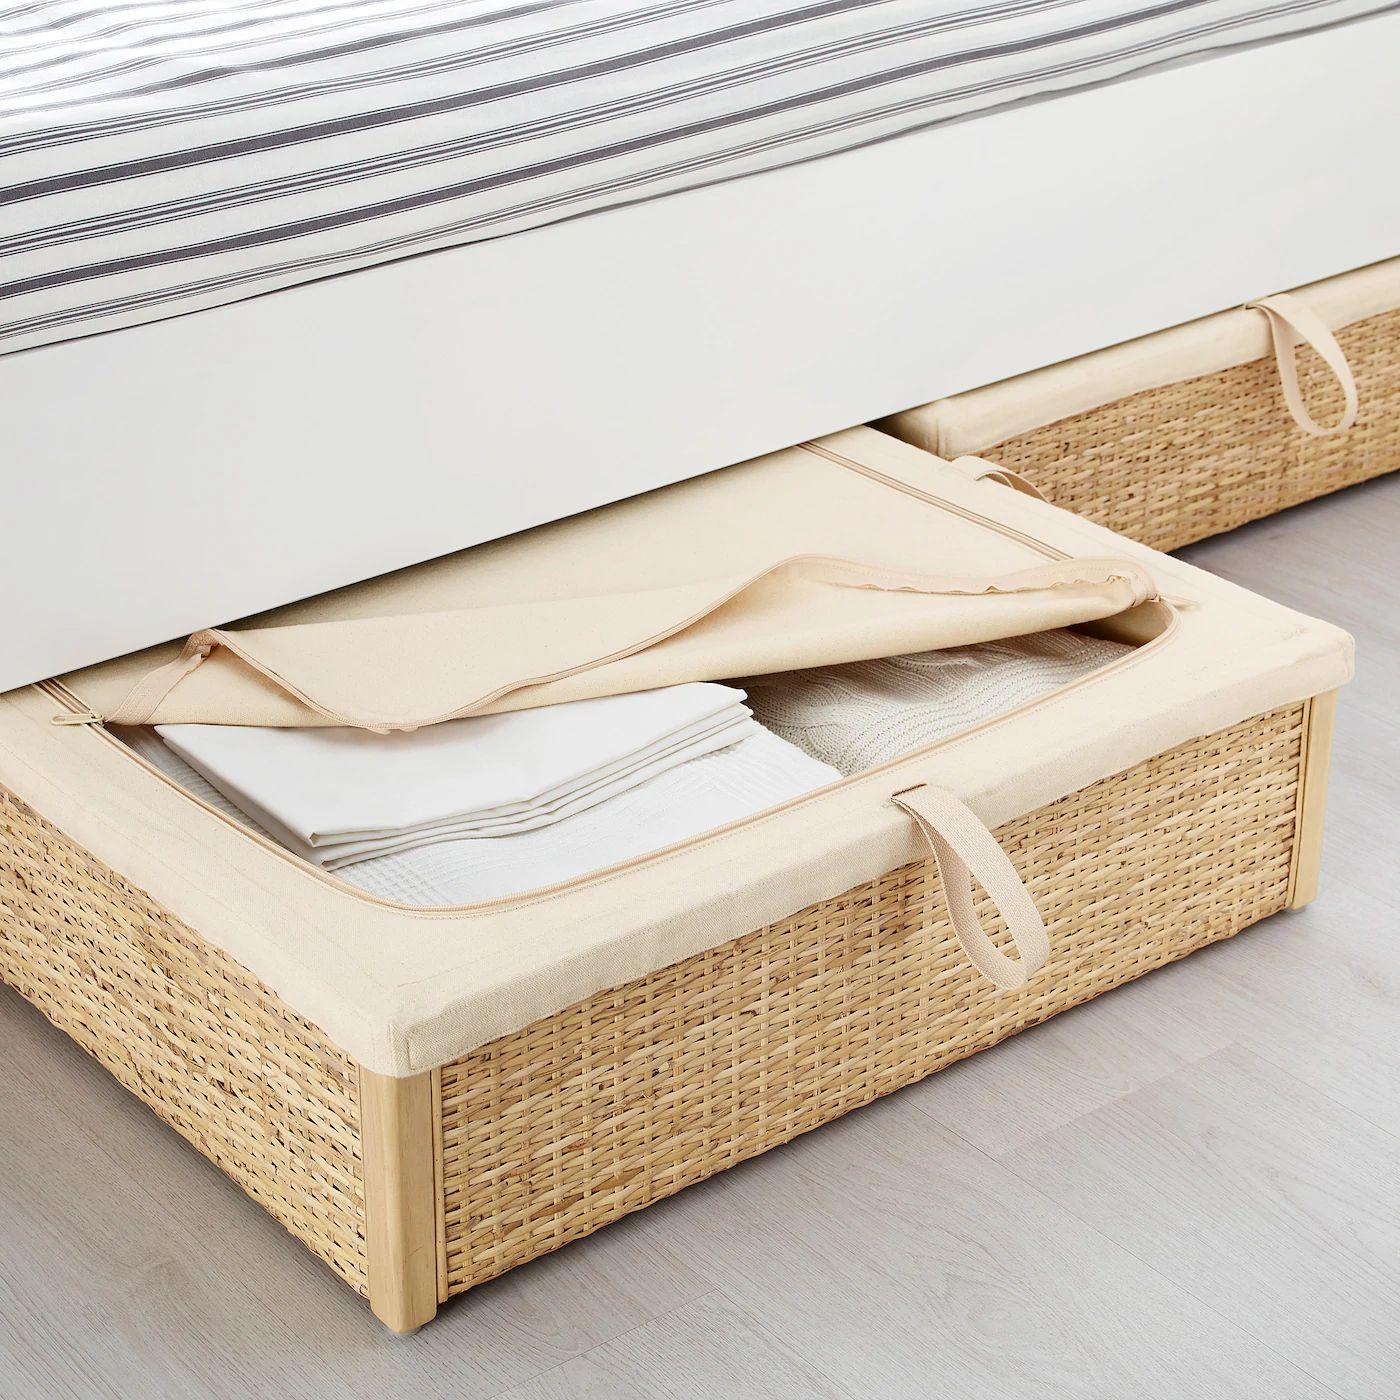 [Ikea Family] Rangement pour lit Römskog - en rotin, 65x70 cm